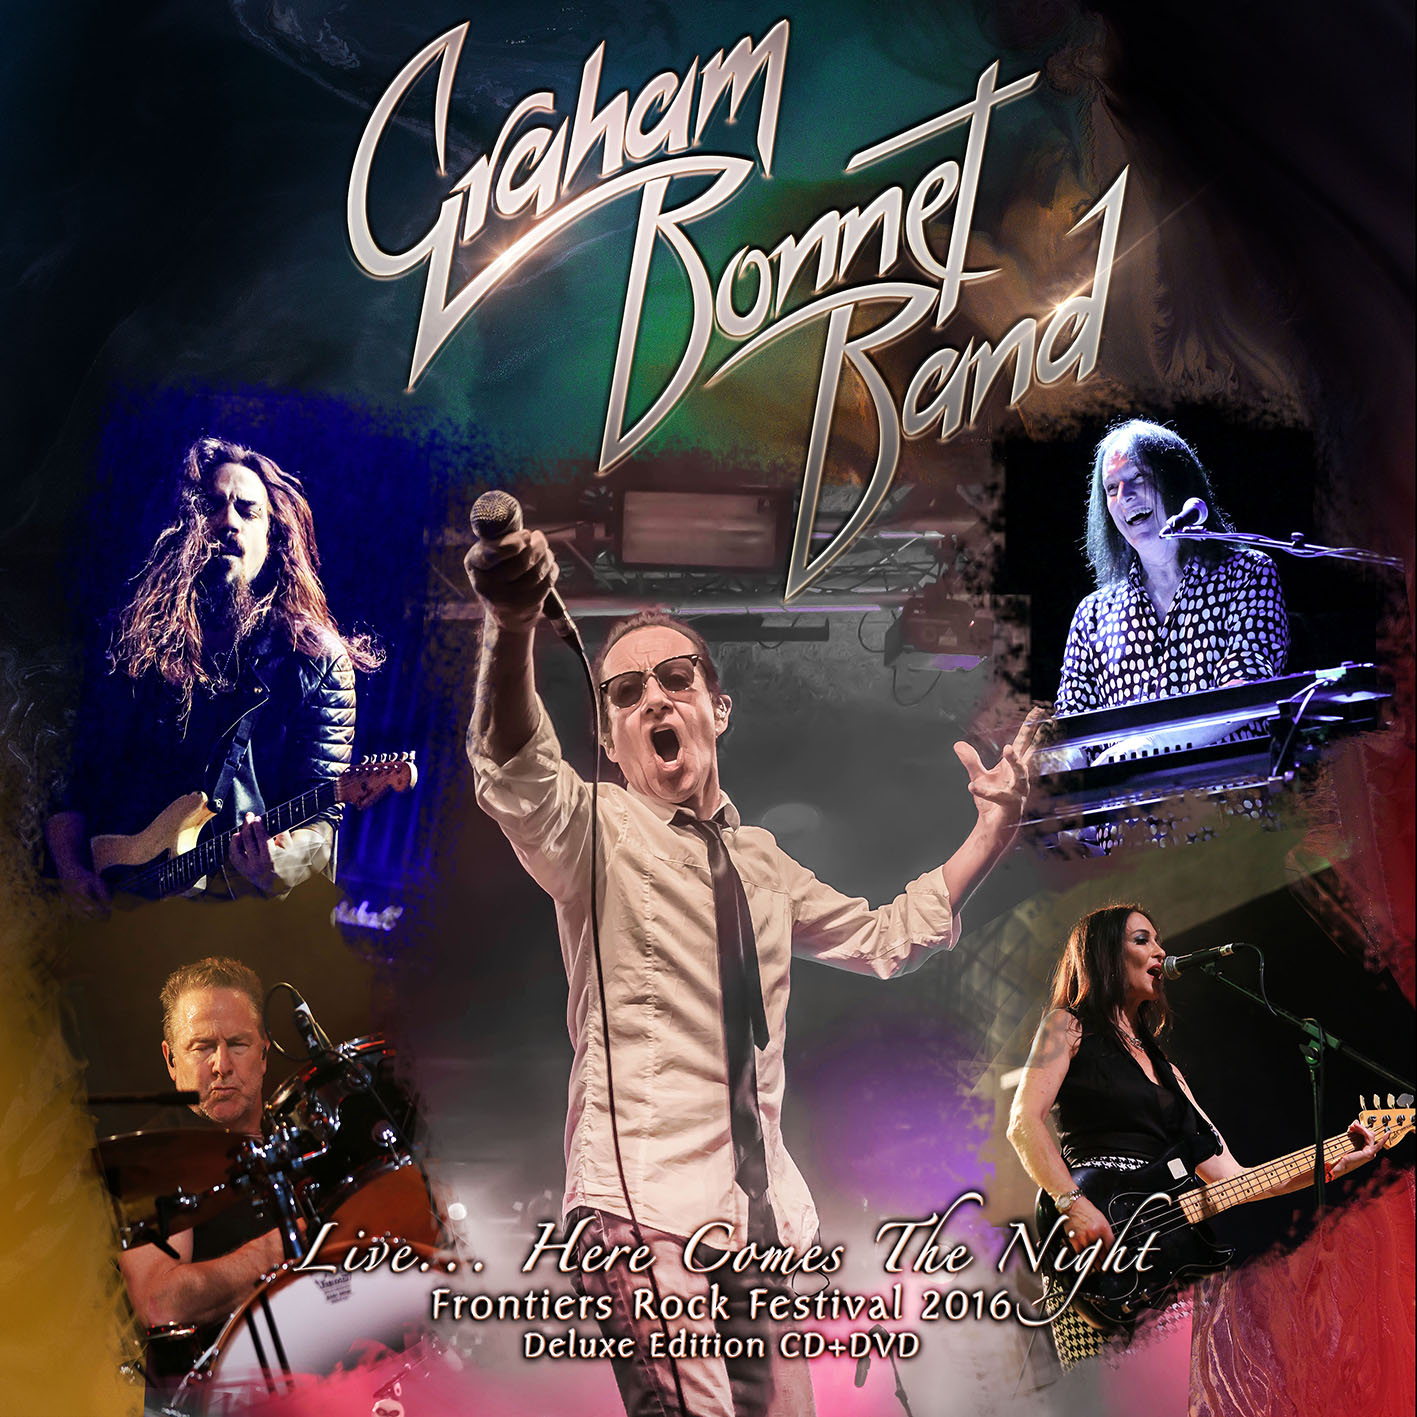 GRAHAM BONNET BAND live